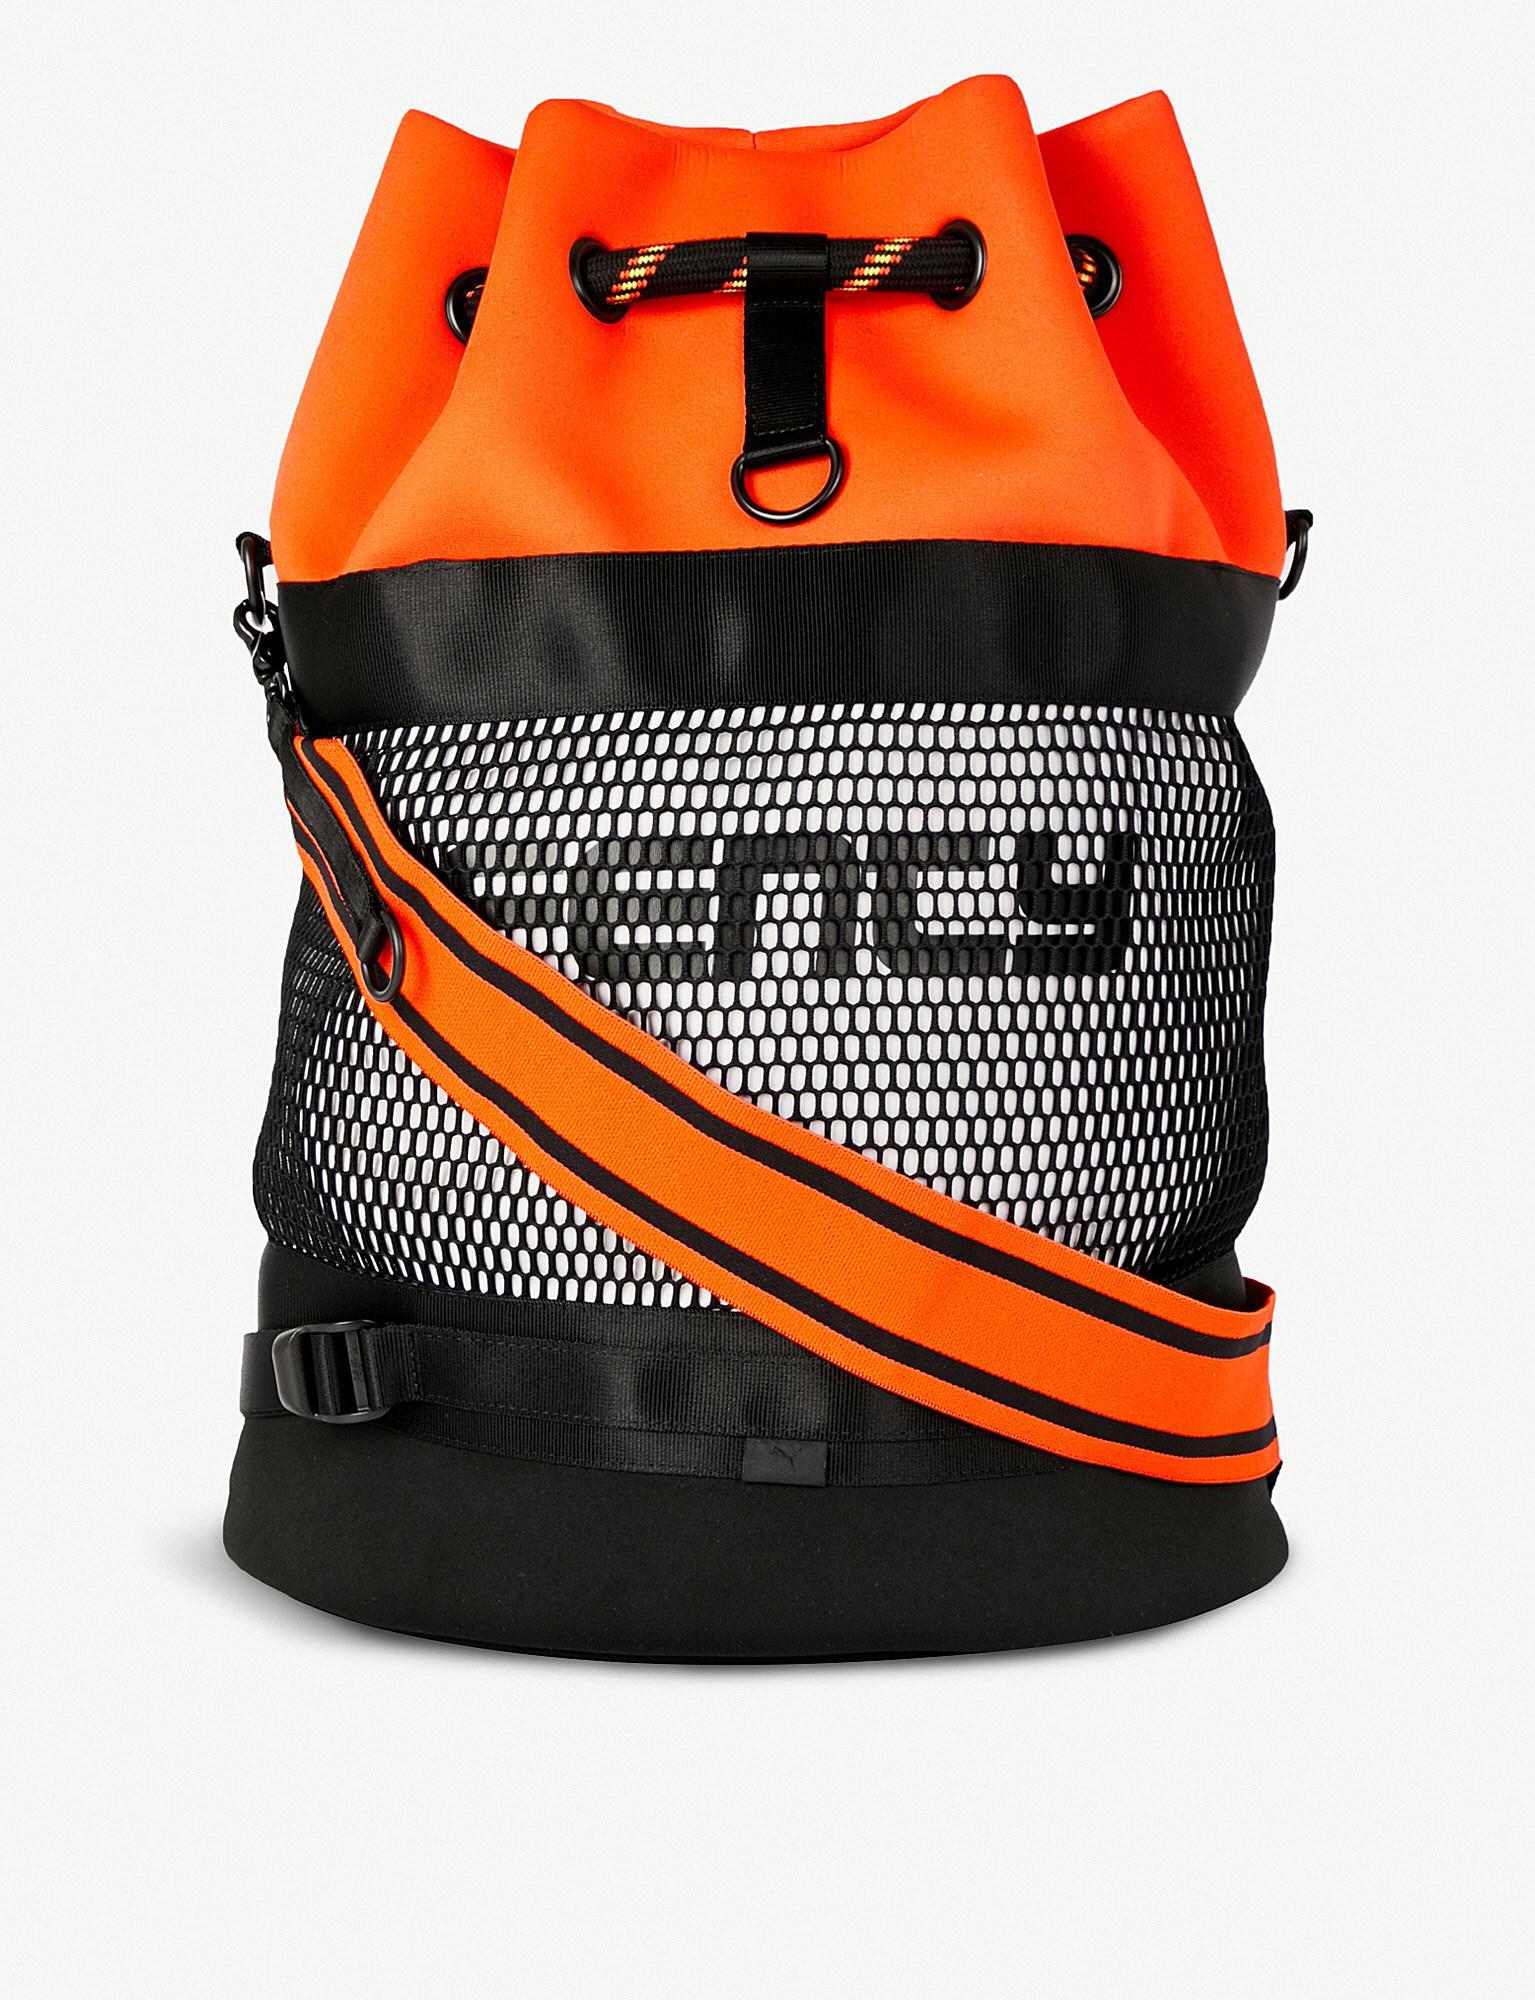 933a762cbe8d Puma Evopower Small Sports Bag